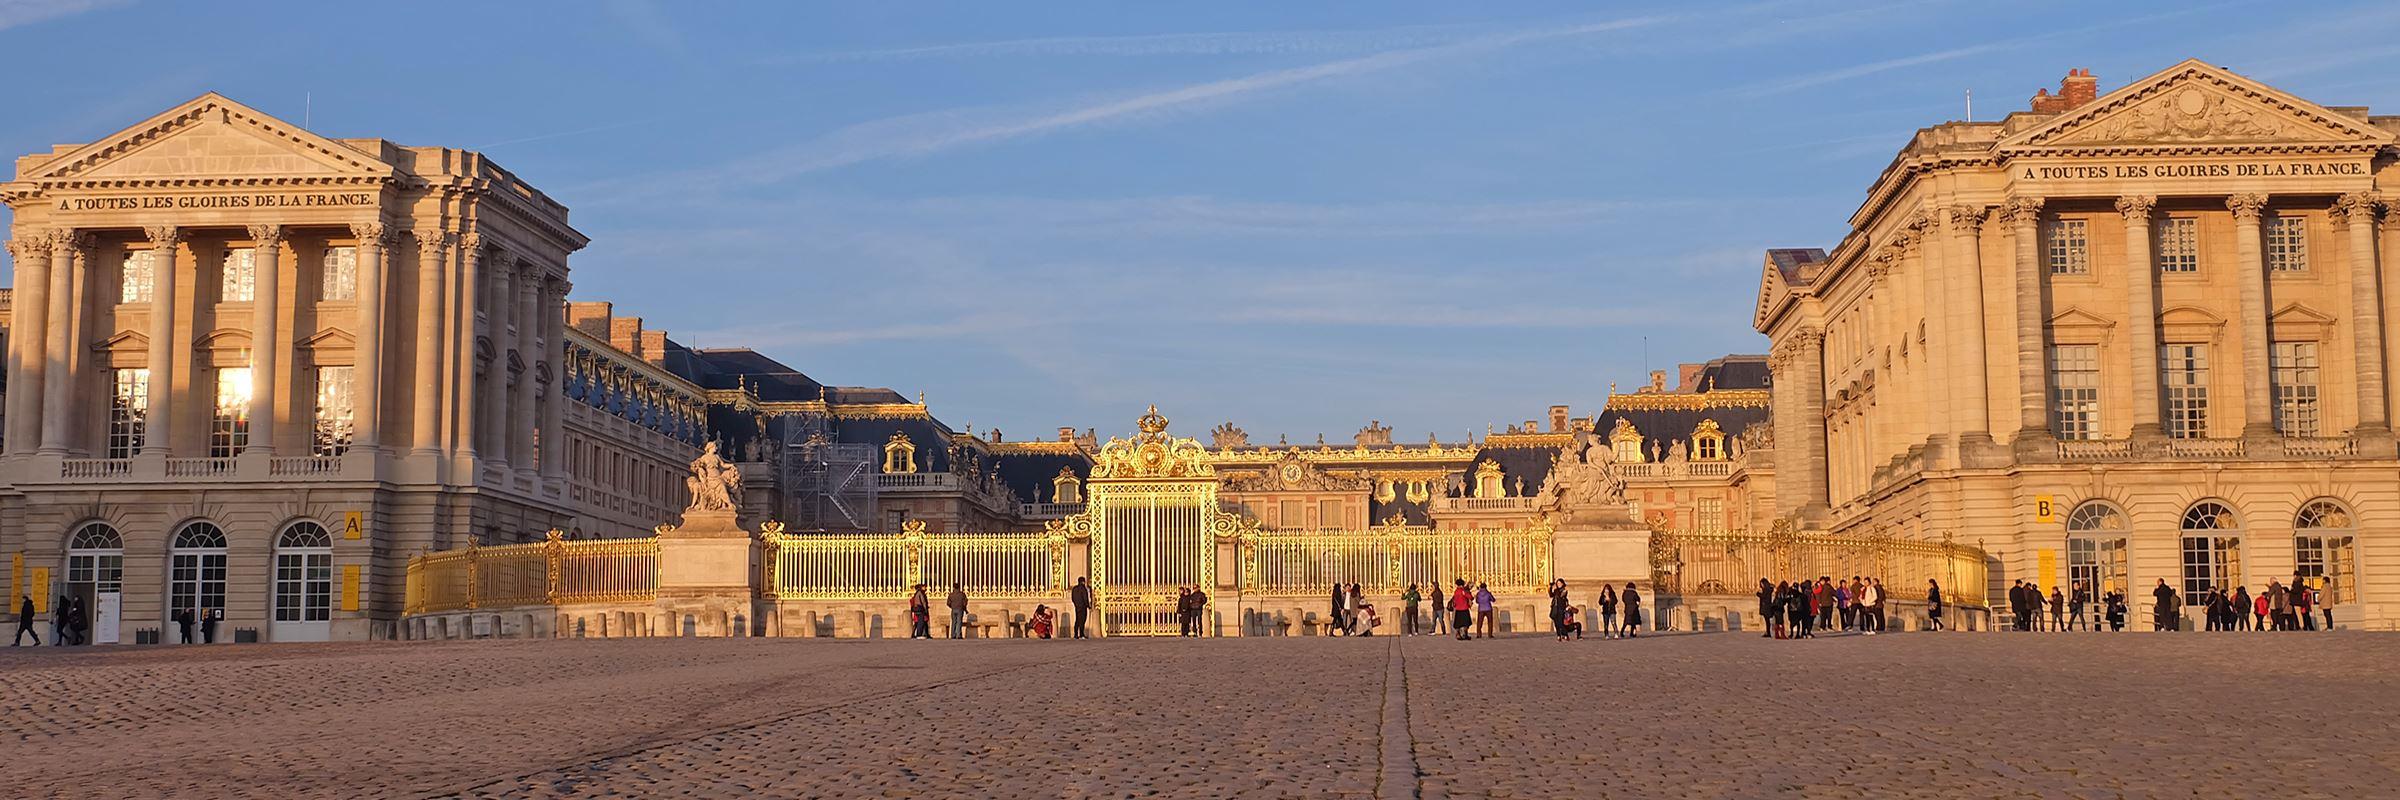 Agen ia de dating Versailles Intalnire gratuita in 86